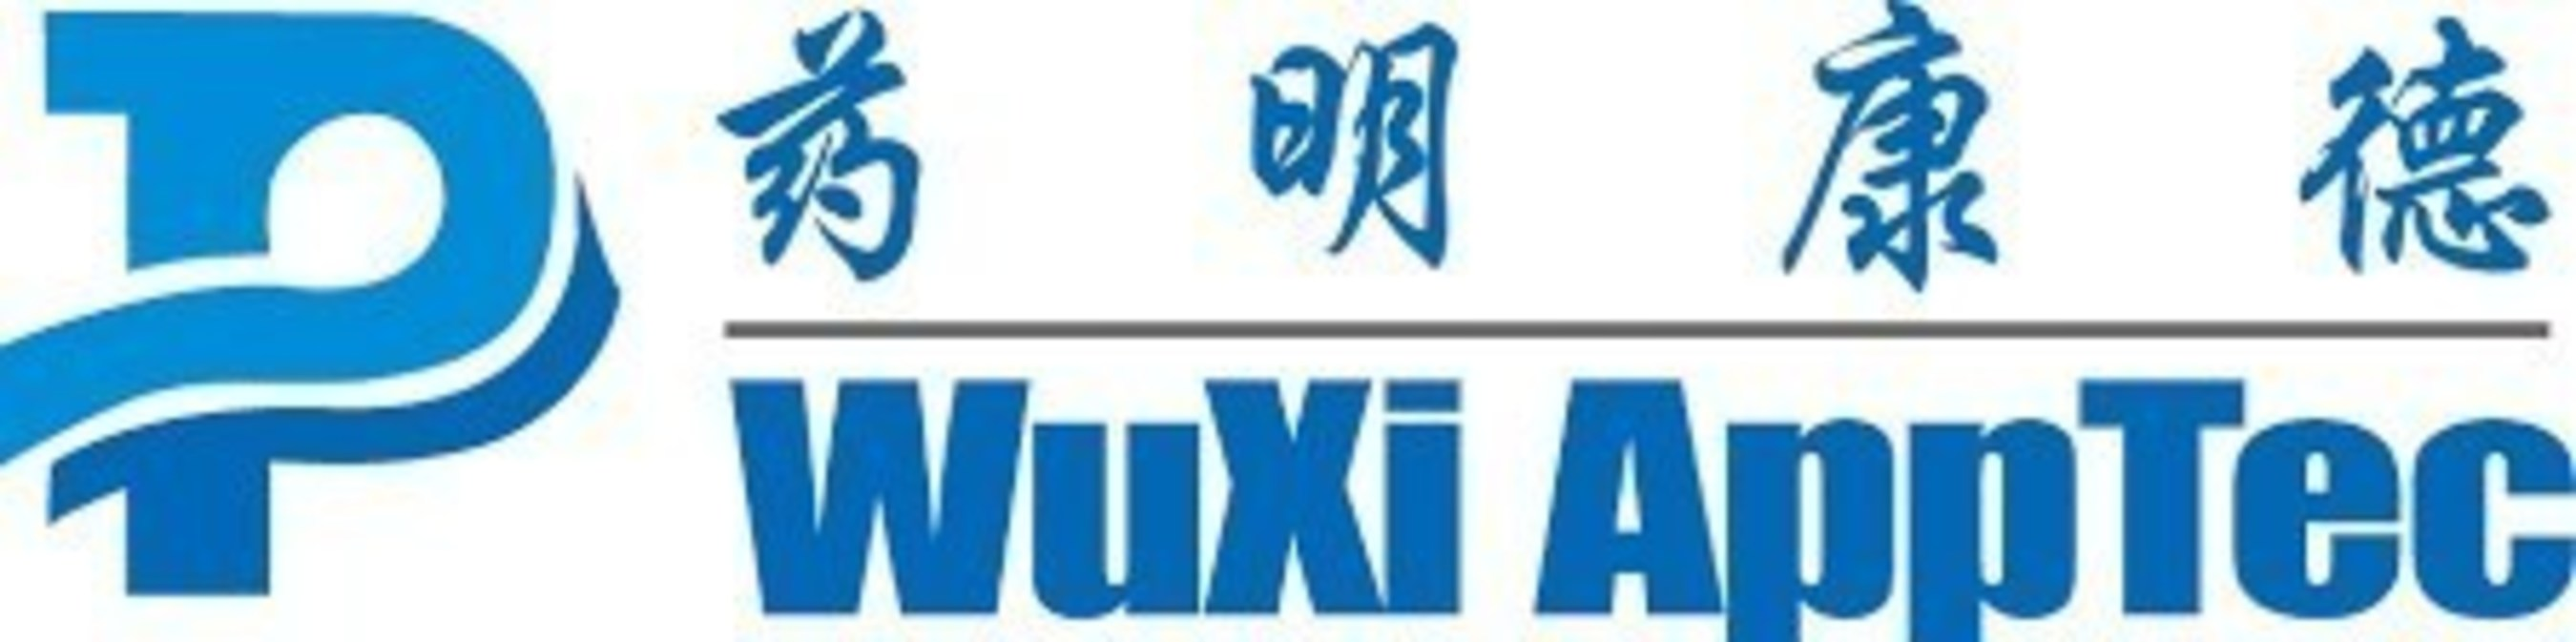 WuXi AppTec logo (PRNewsFoto/WuXi NextCODE)